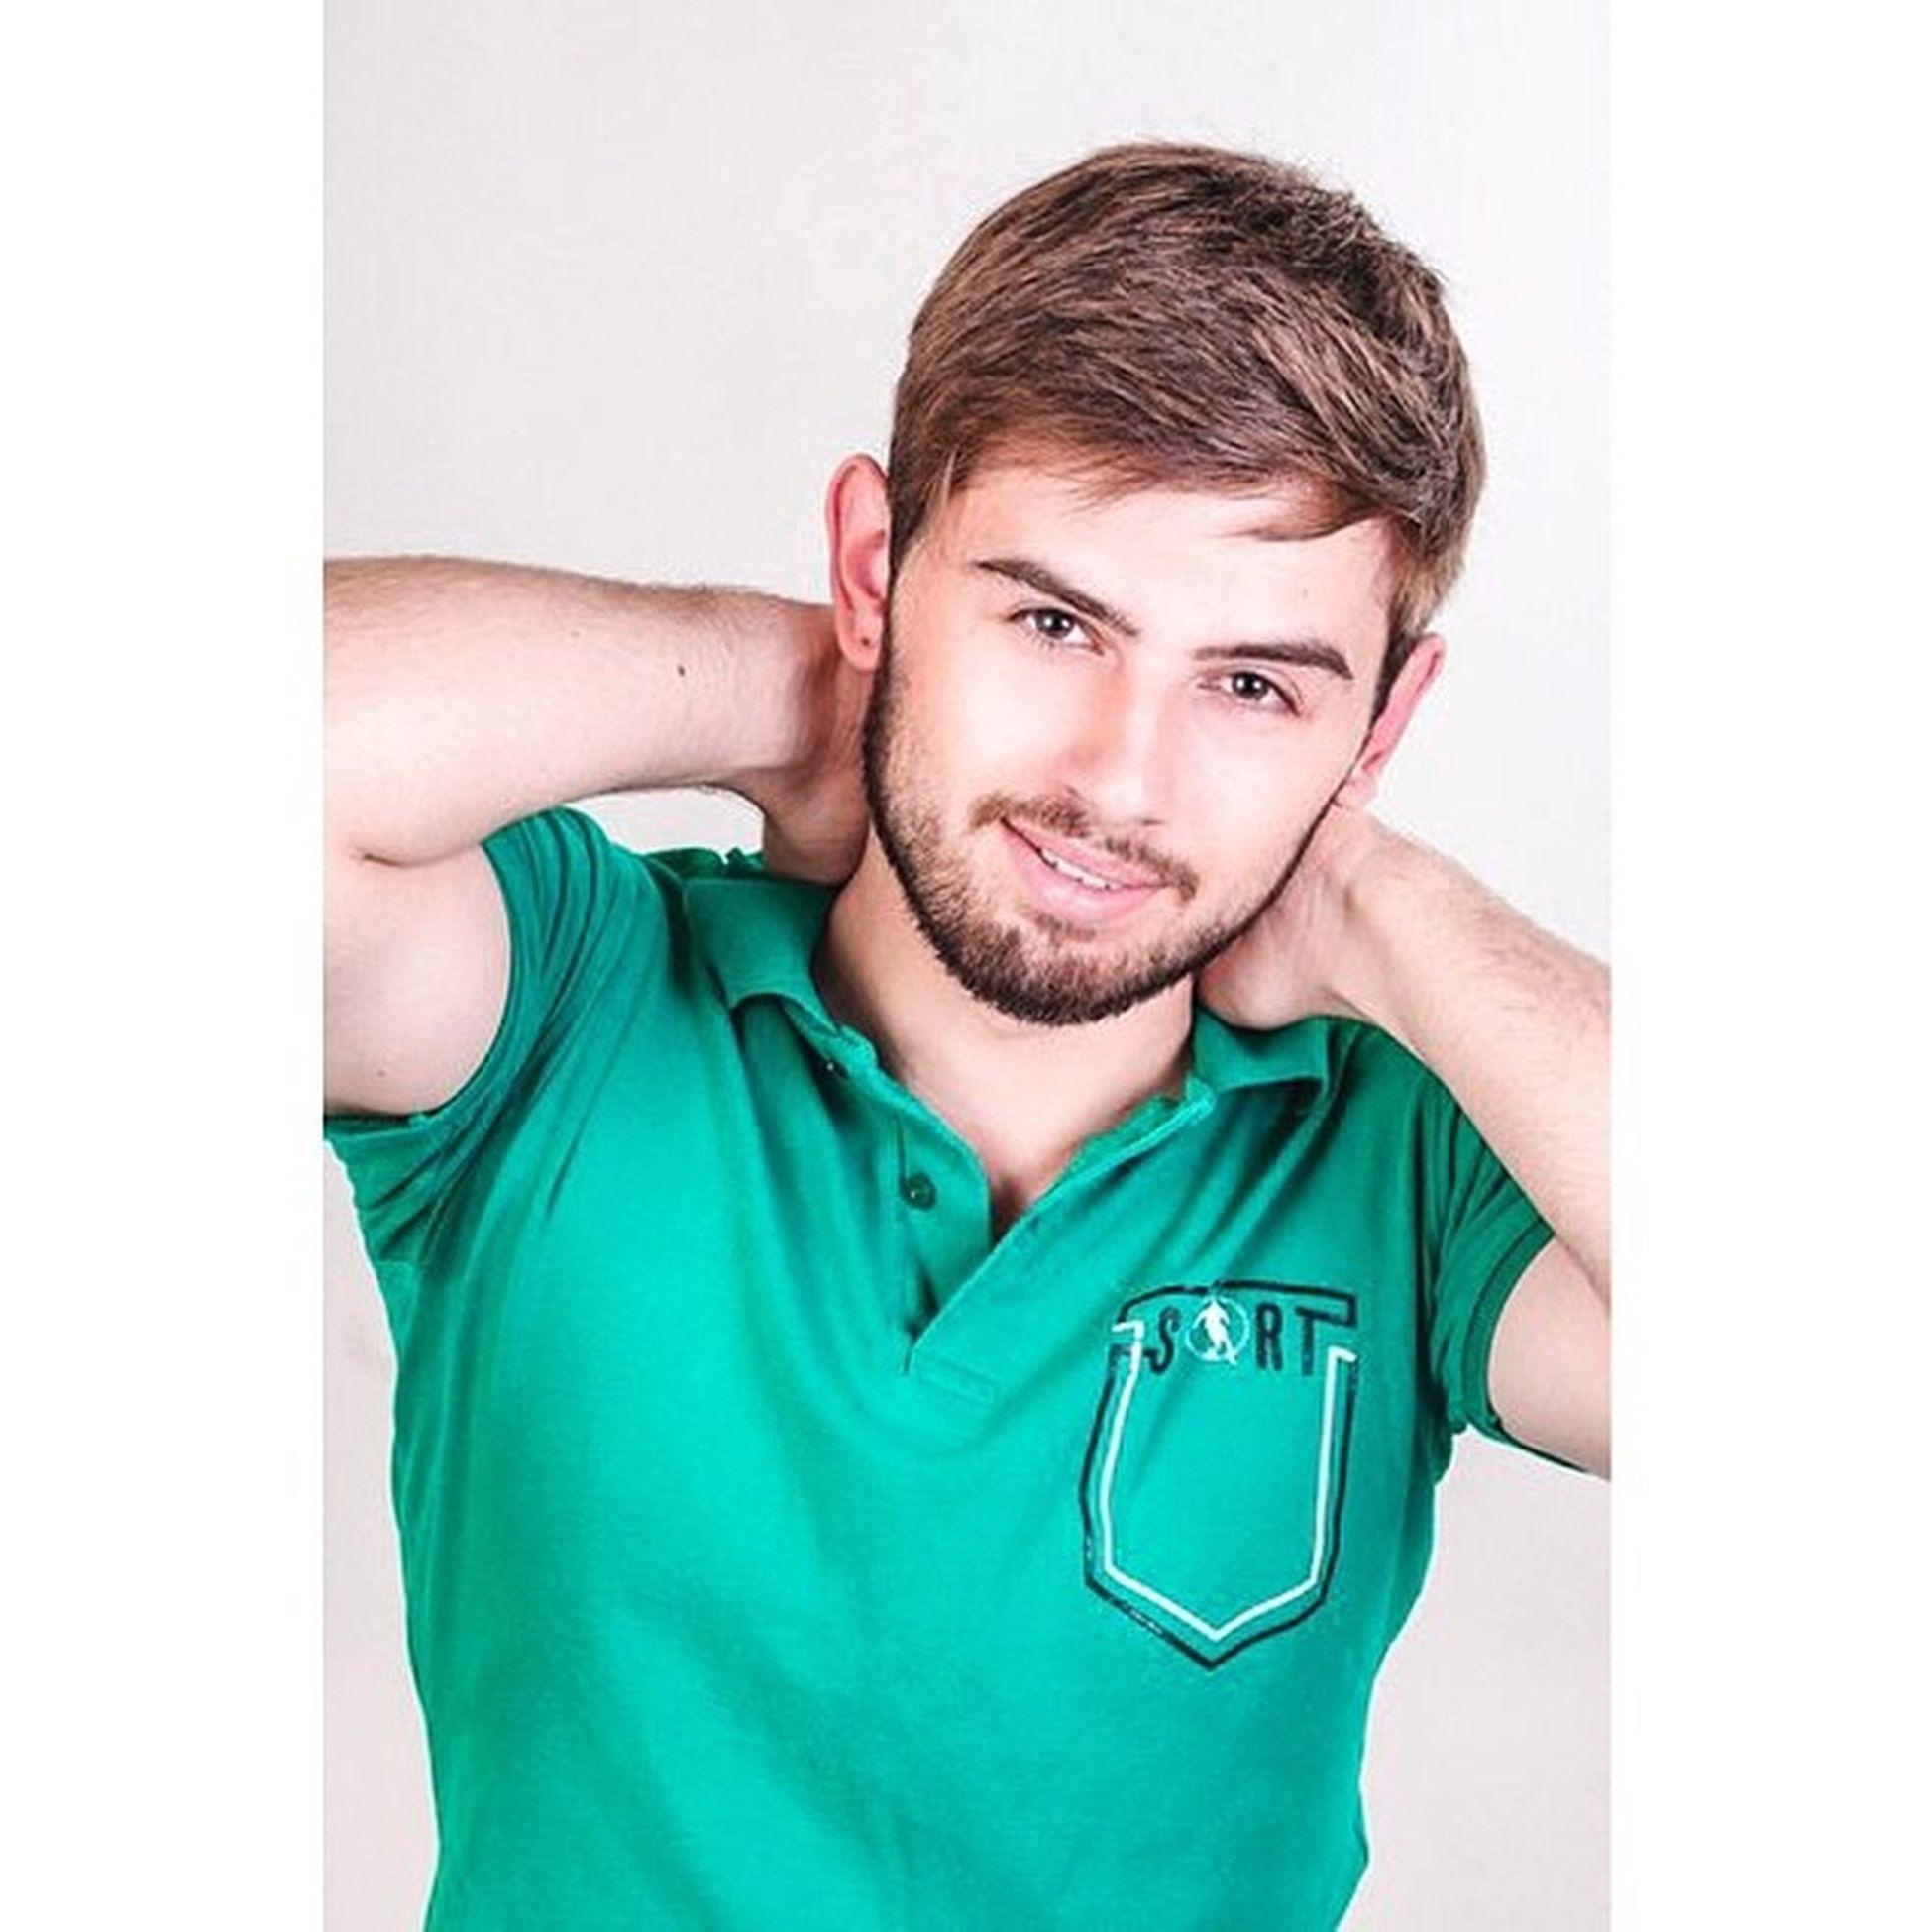 Pm Platinummodels26 Men Models fashionпортрет